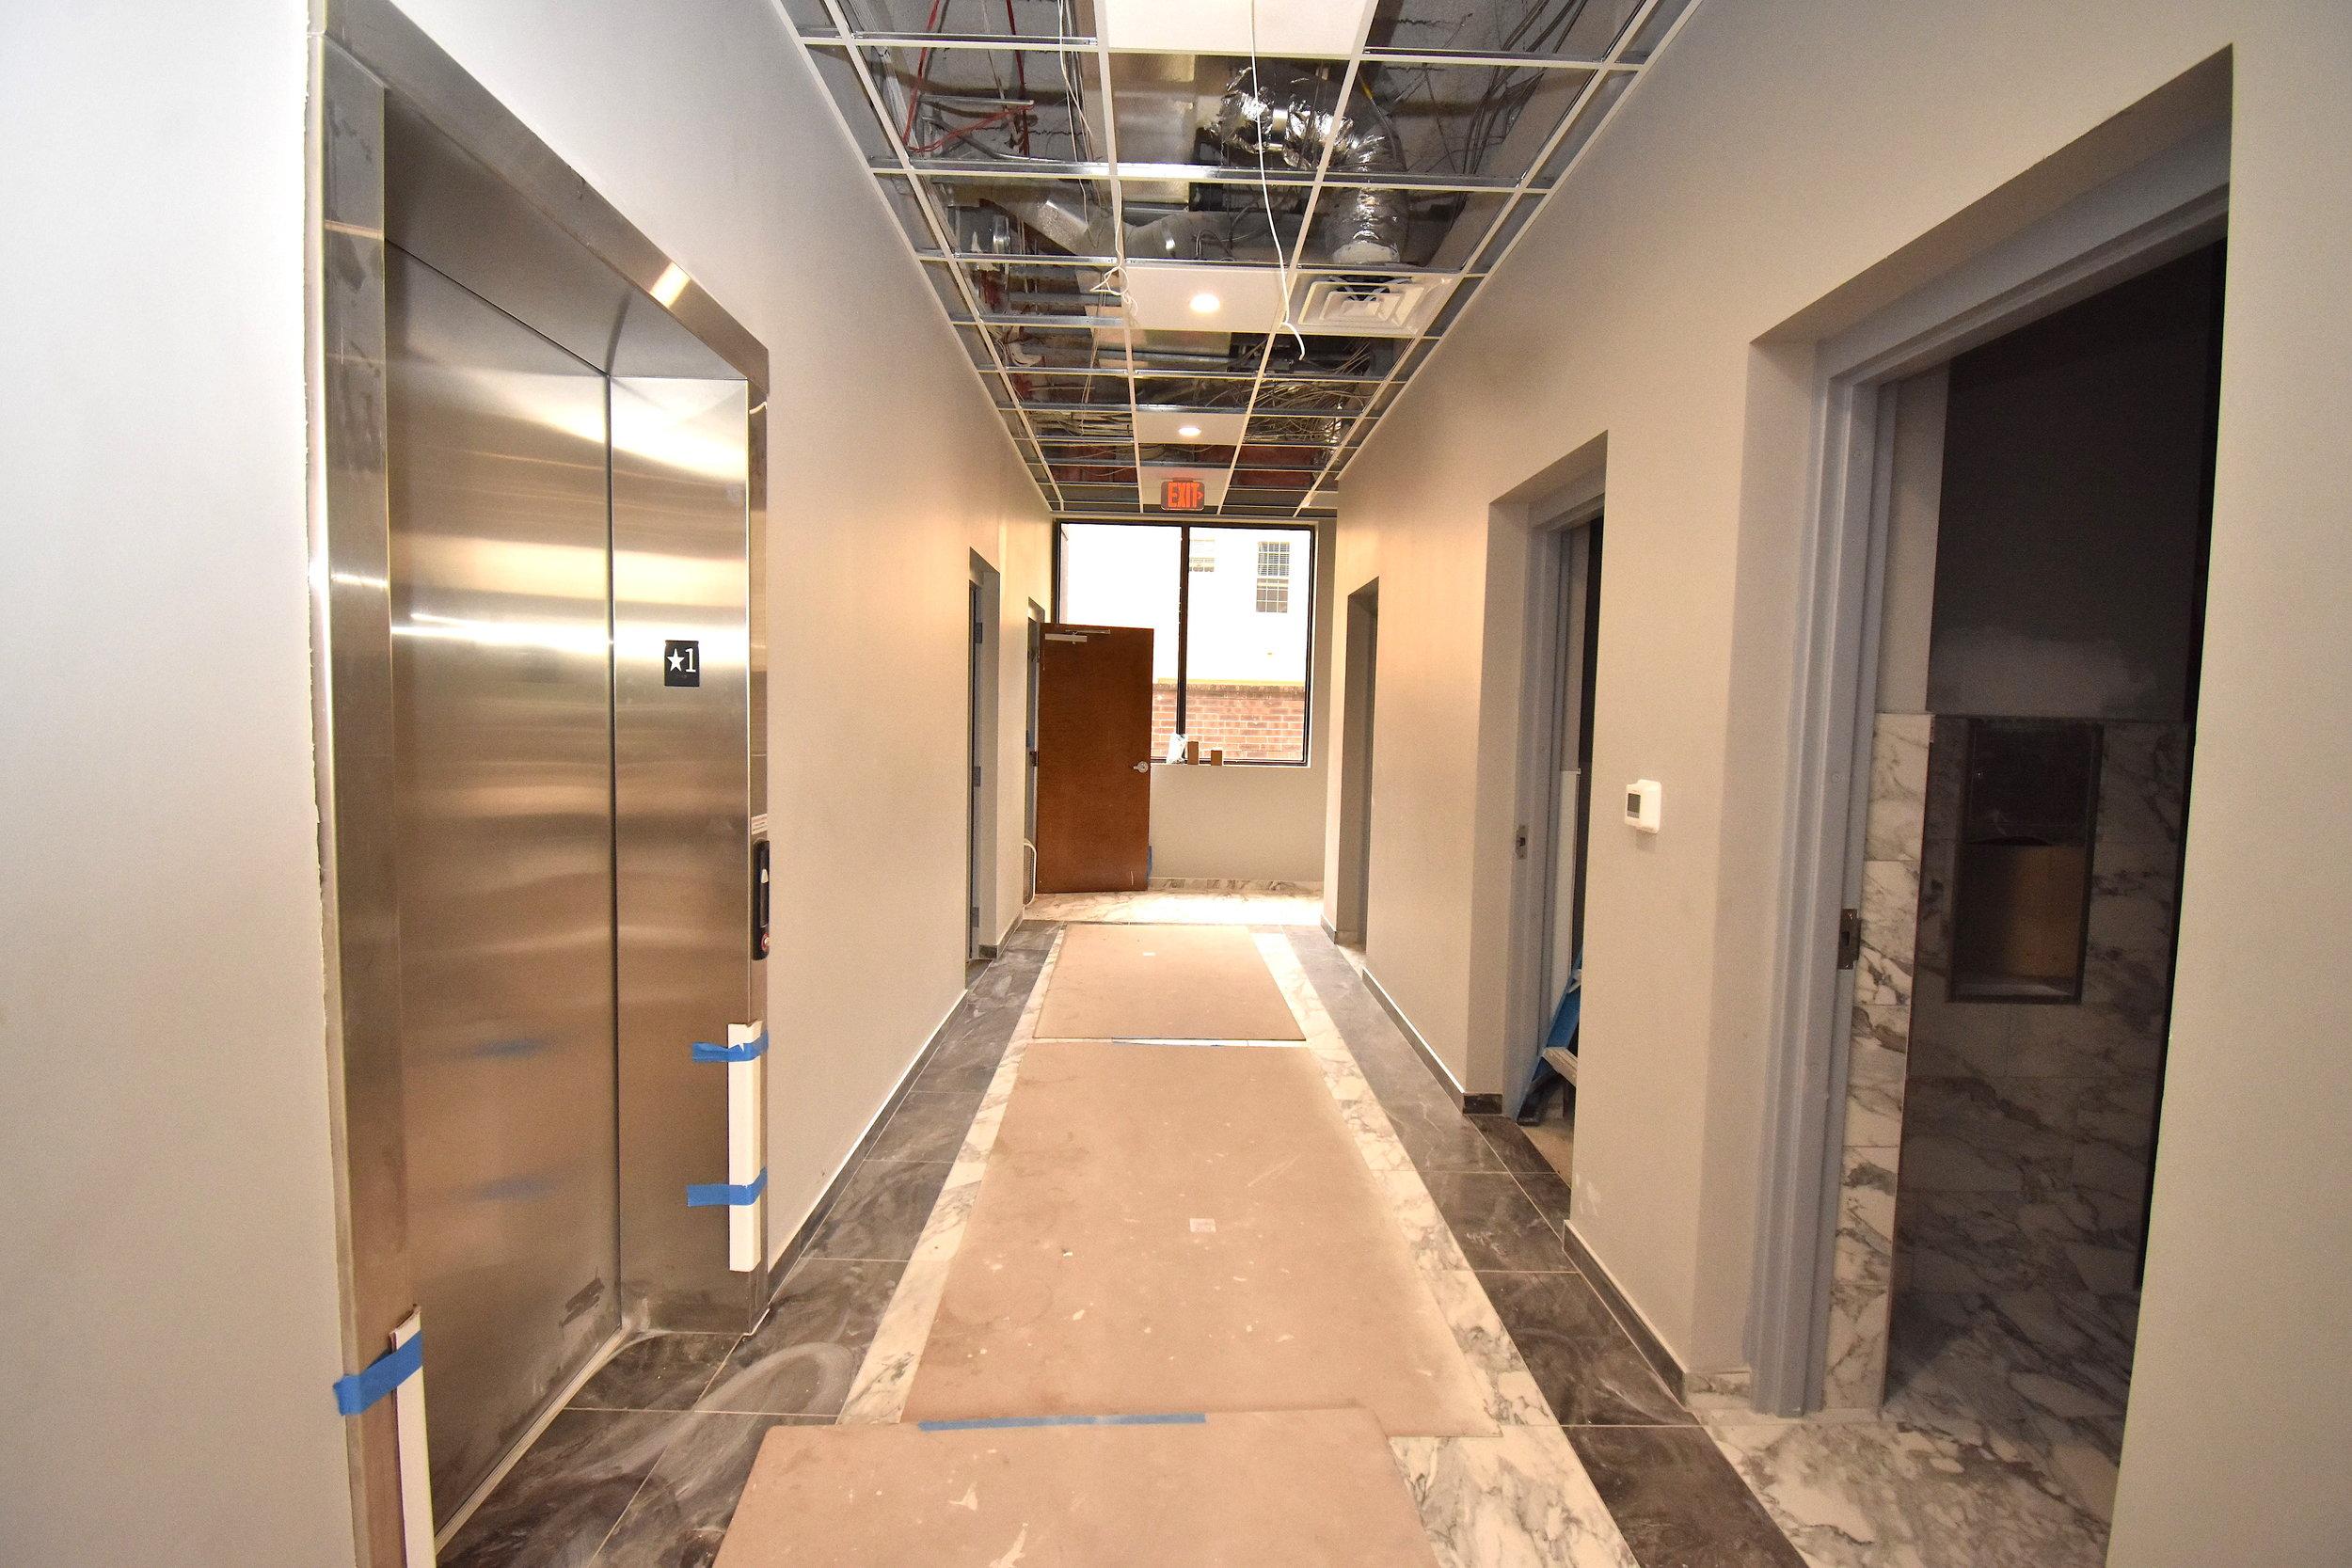 DS Hallway.JPG